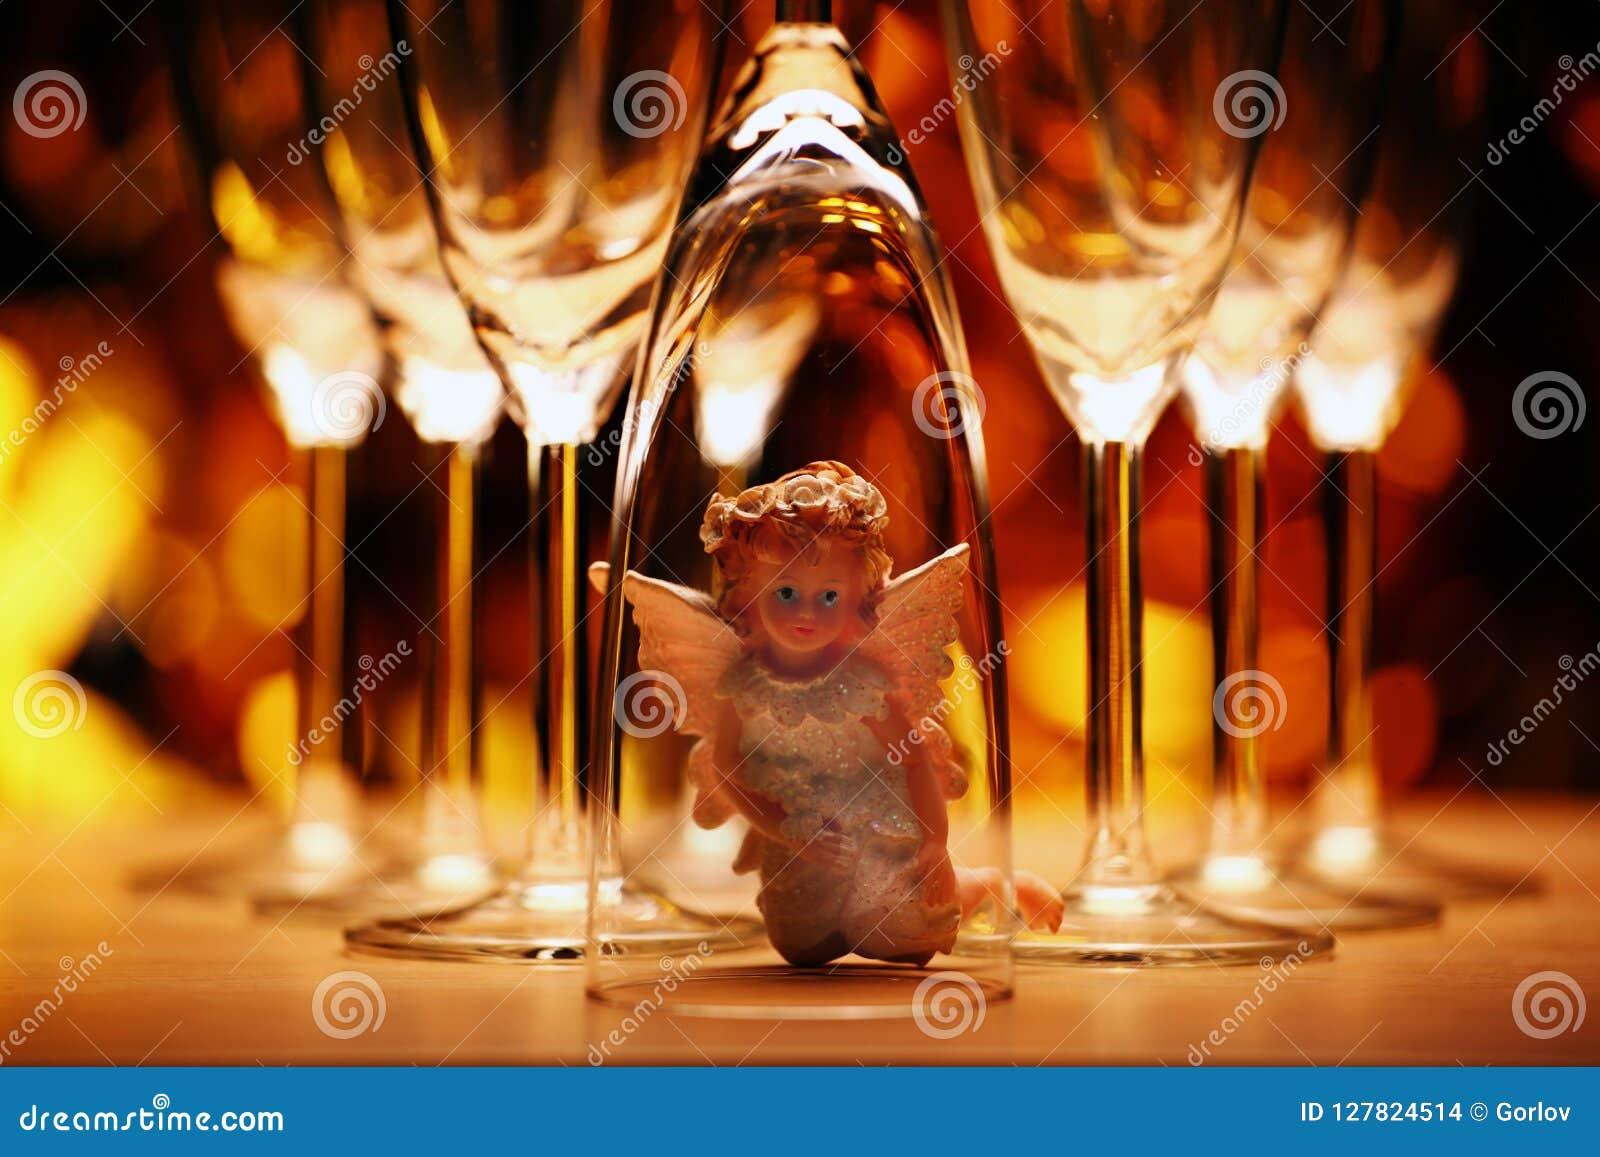 Wedding champagne glass Angel studio